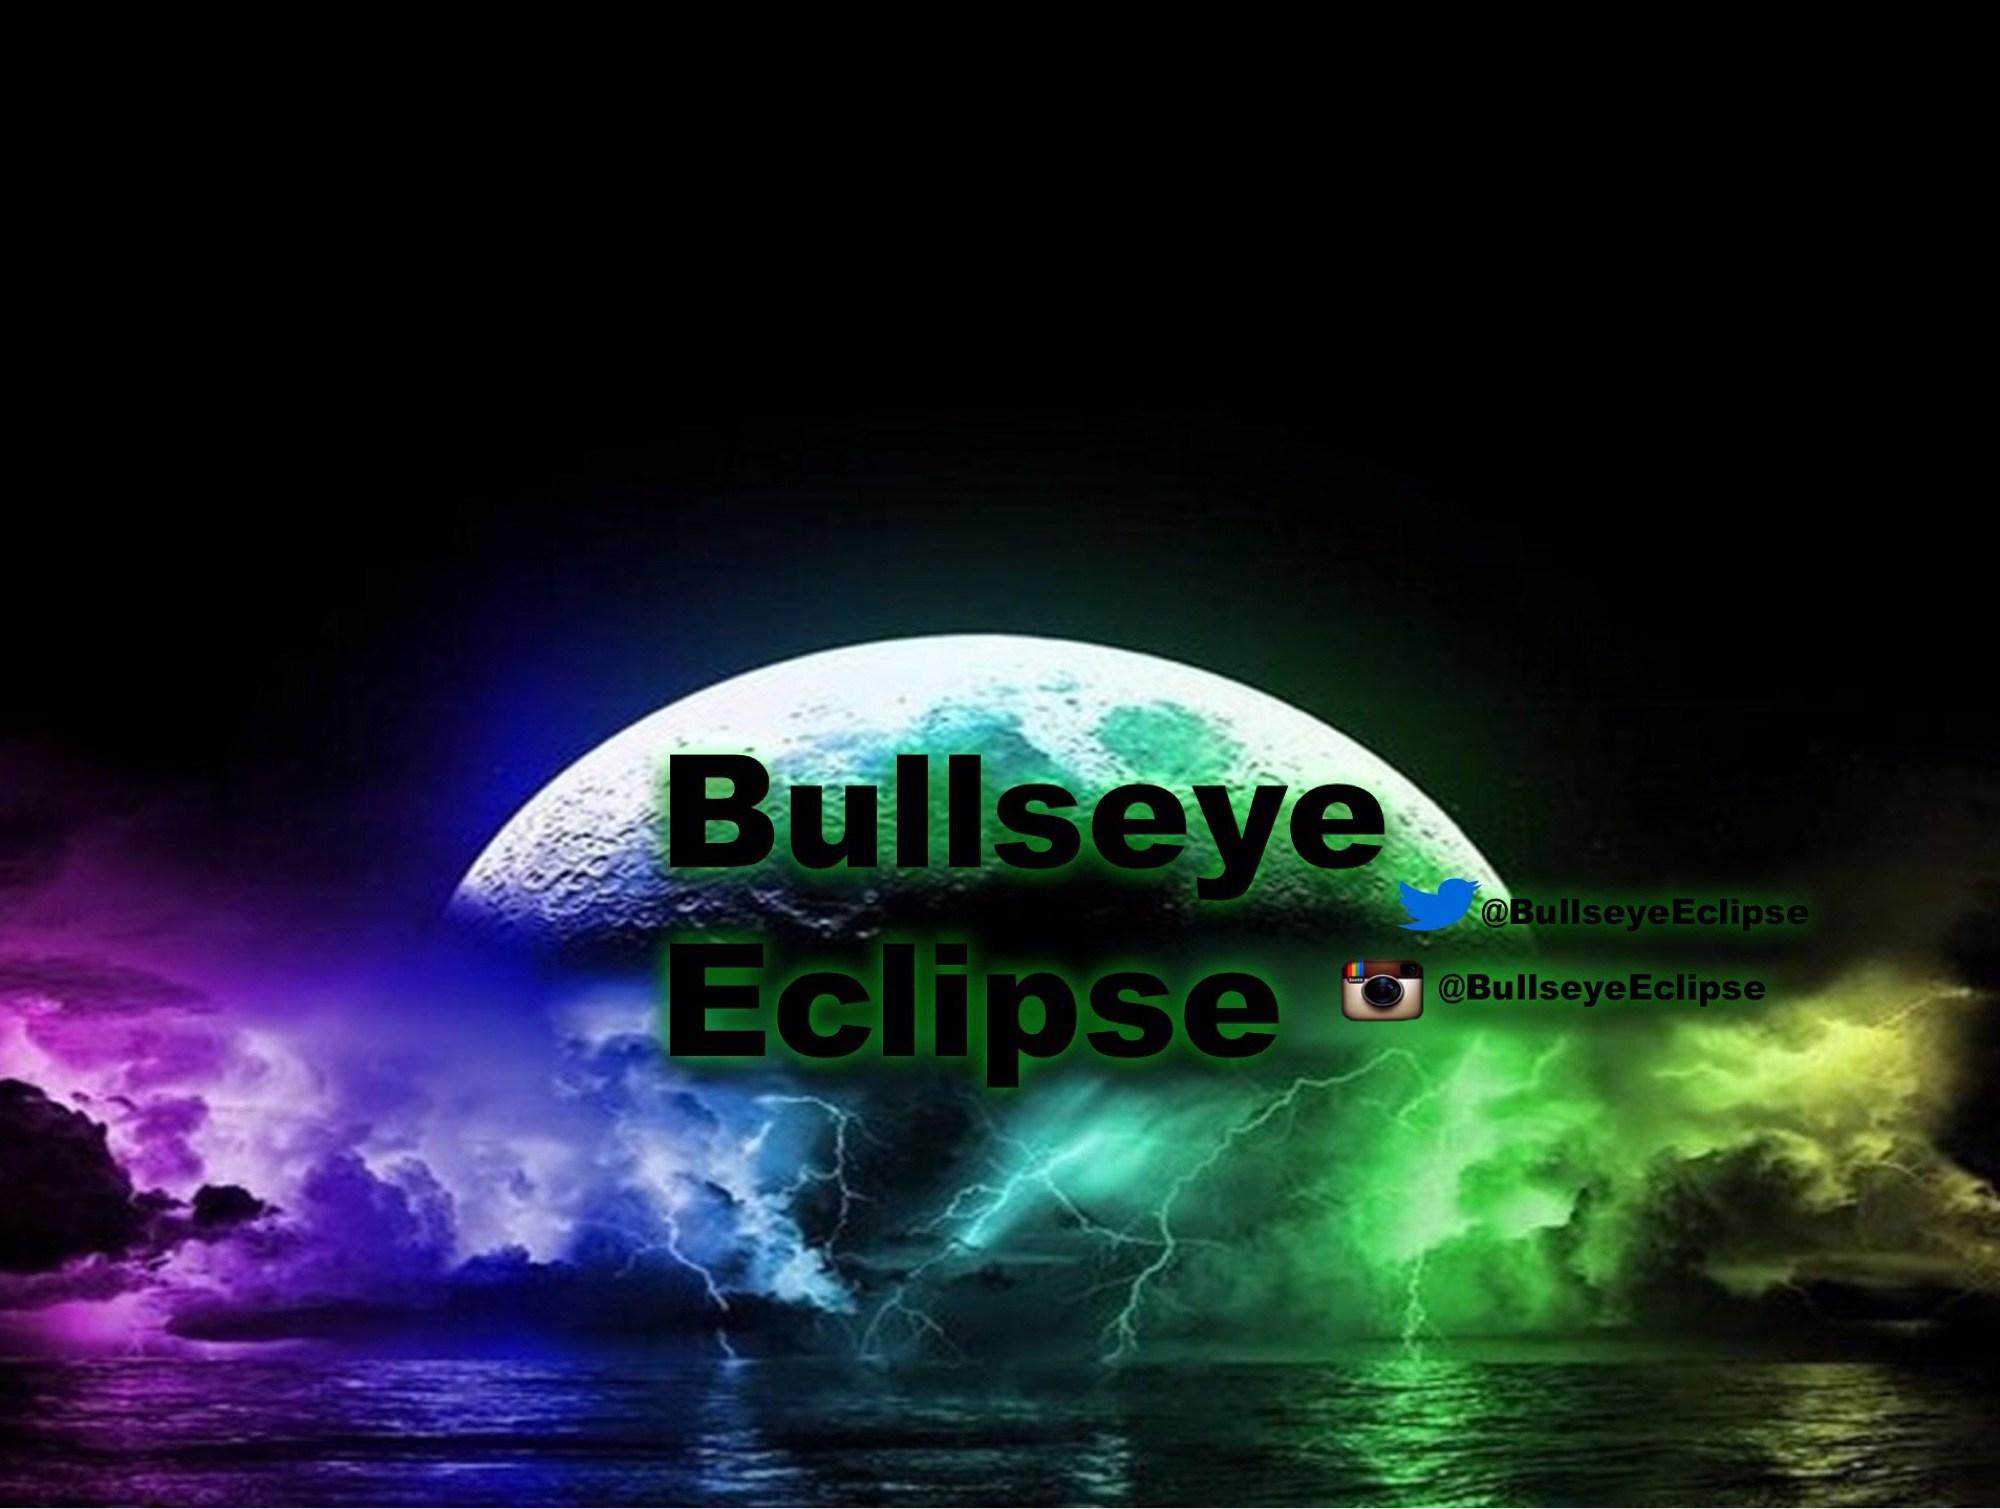 BullseyeEclipse's Cover Photo